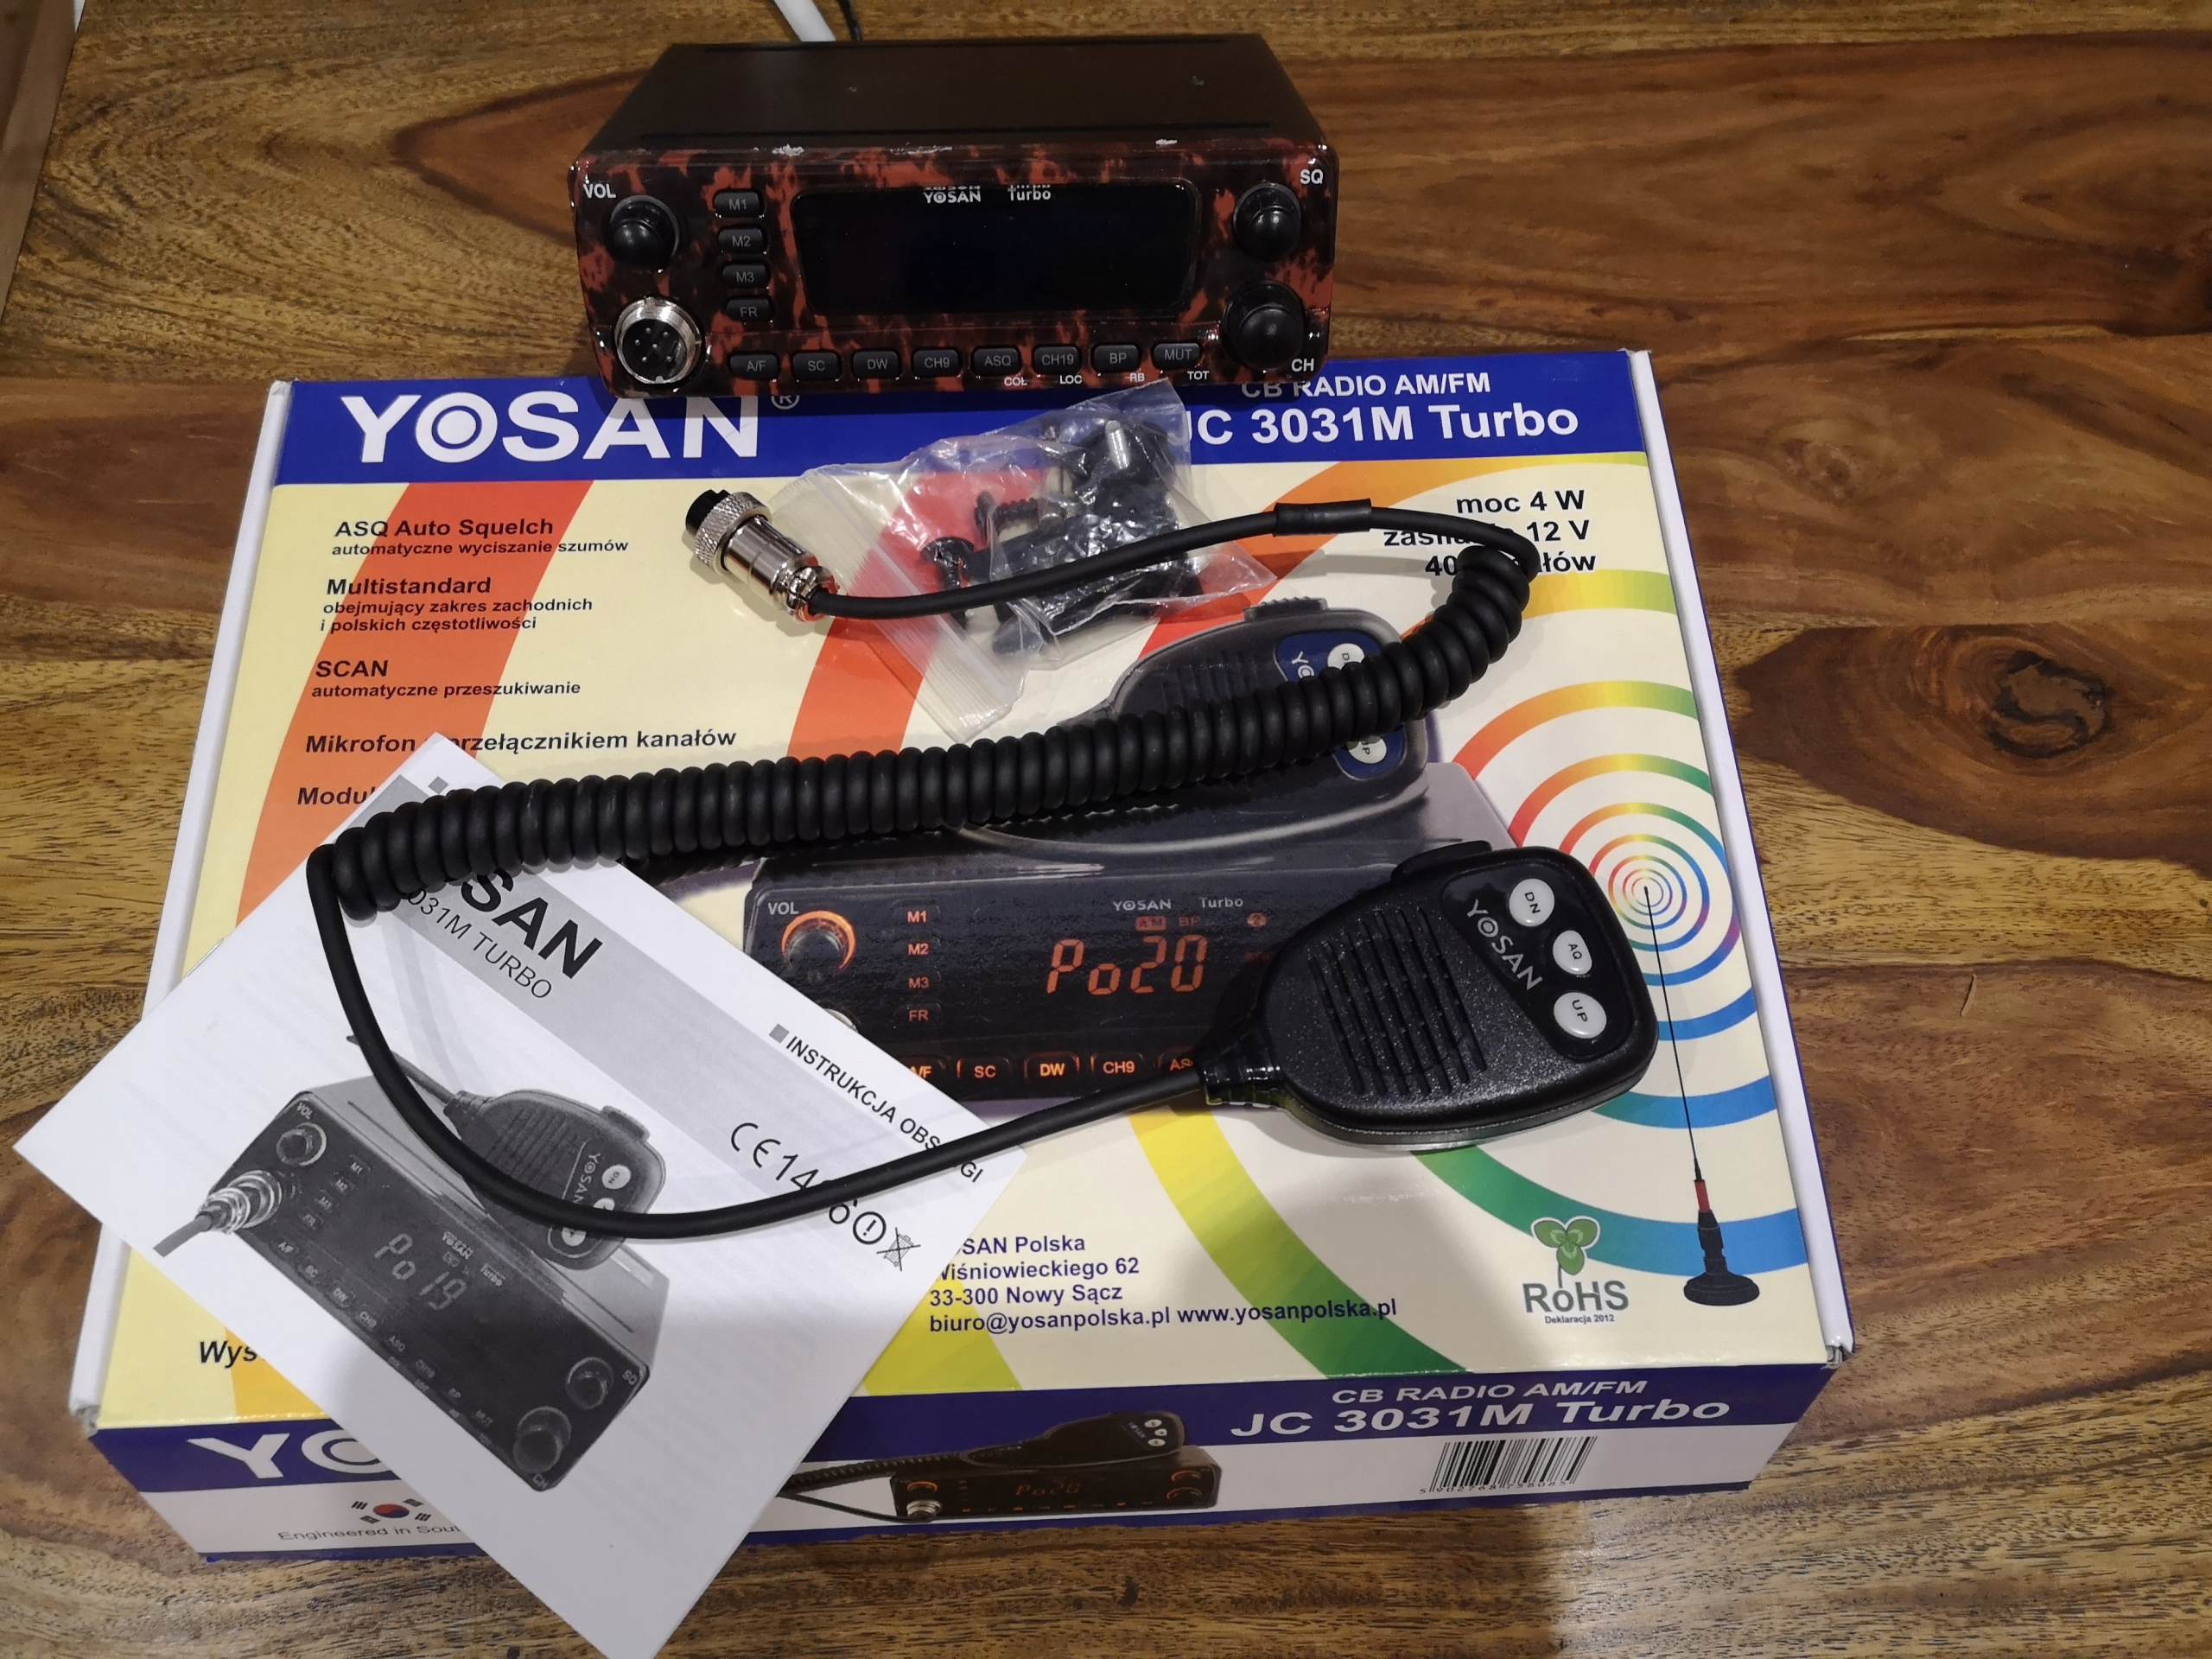 CB - Radio Yosan JC3031M Turbo